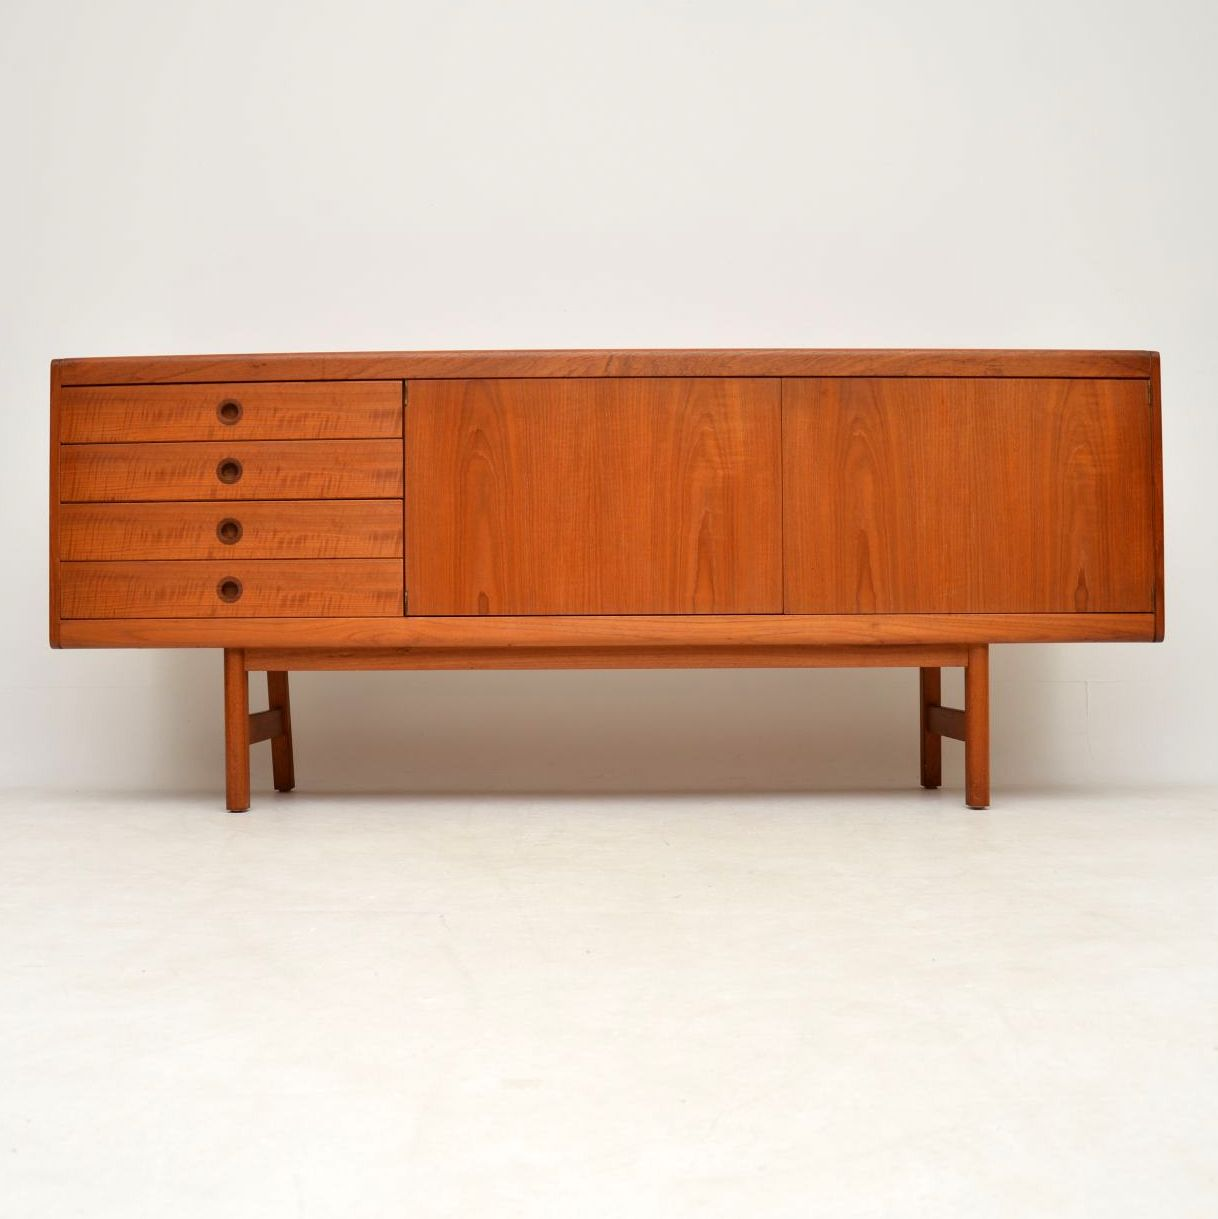 teak_vintage_retro_sideboard_by_robert_heritage_archie_shine_2